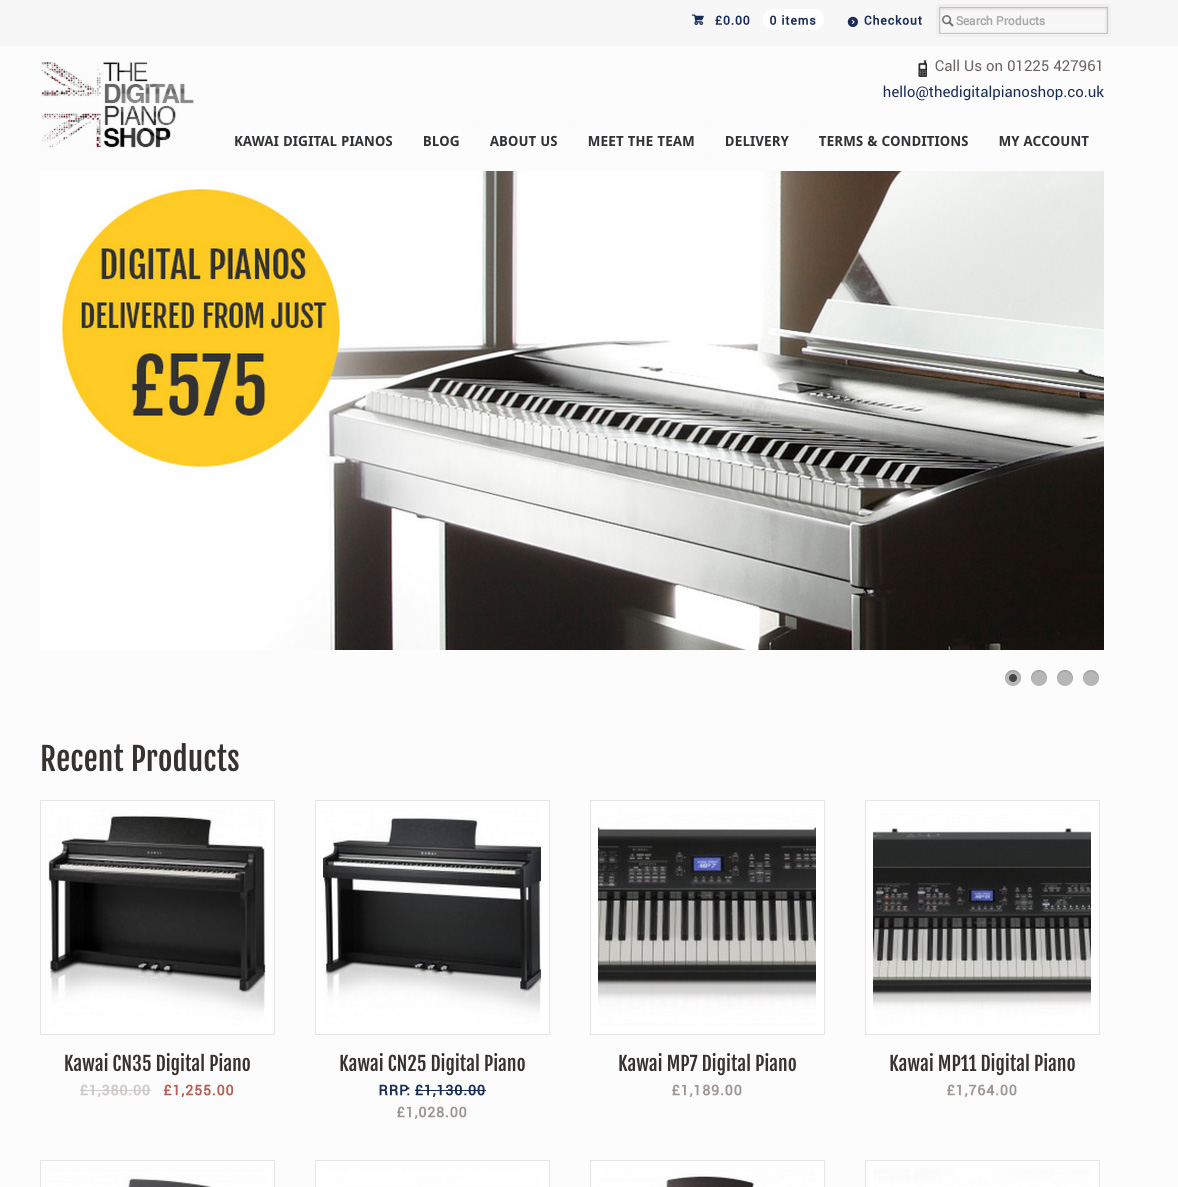 A screen shot of The Digital Piano Shop